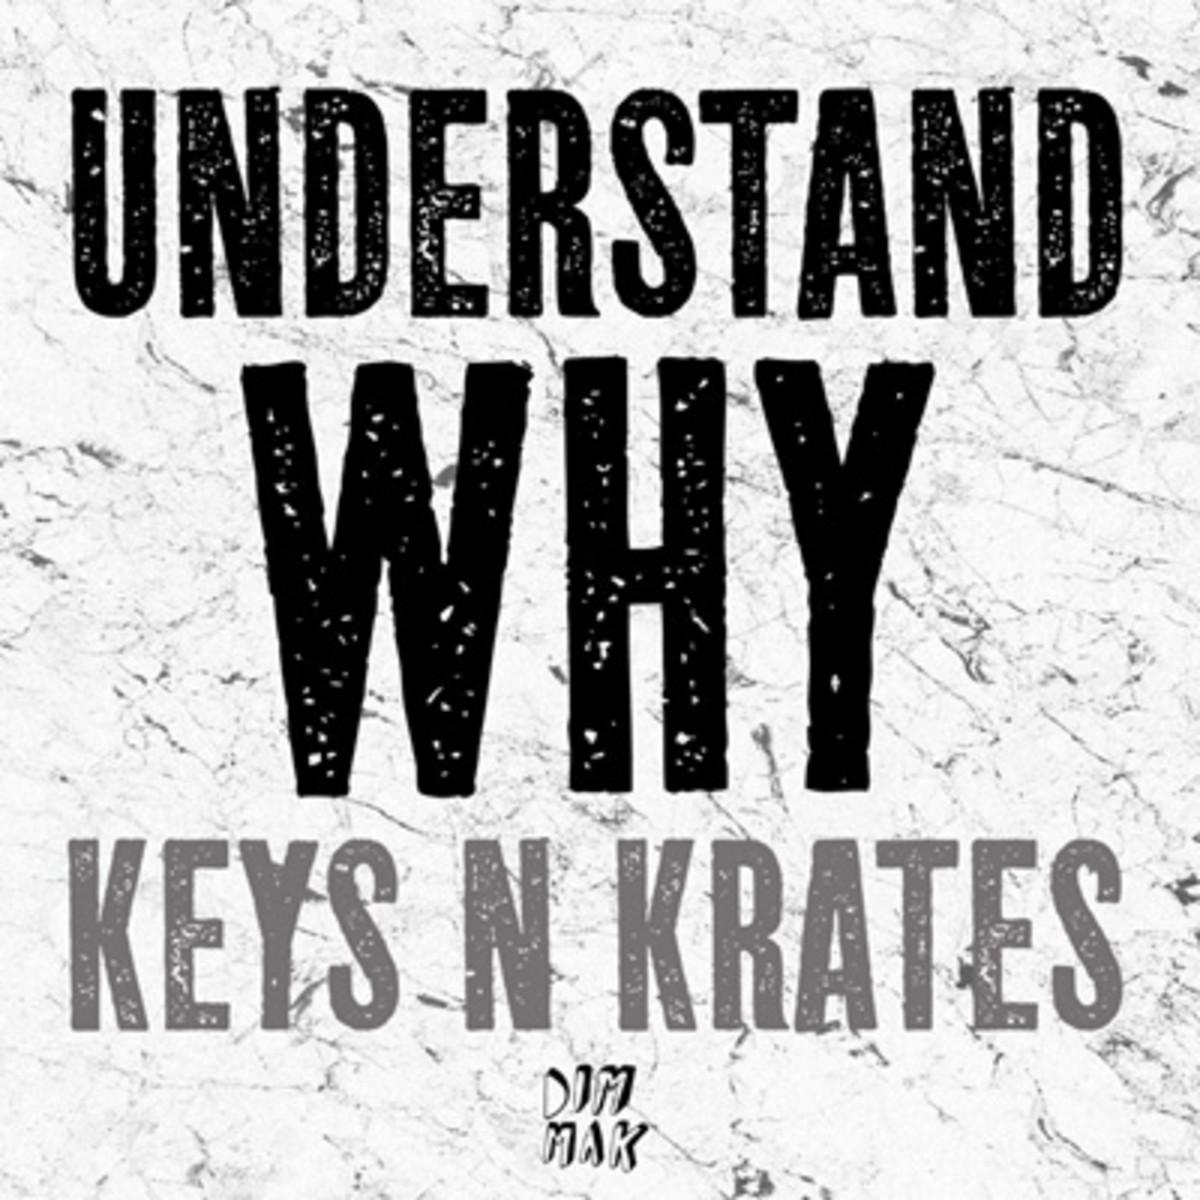 keysnkrates-understandwhy.jpg